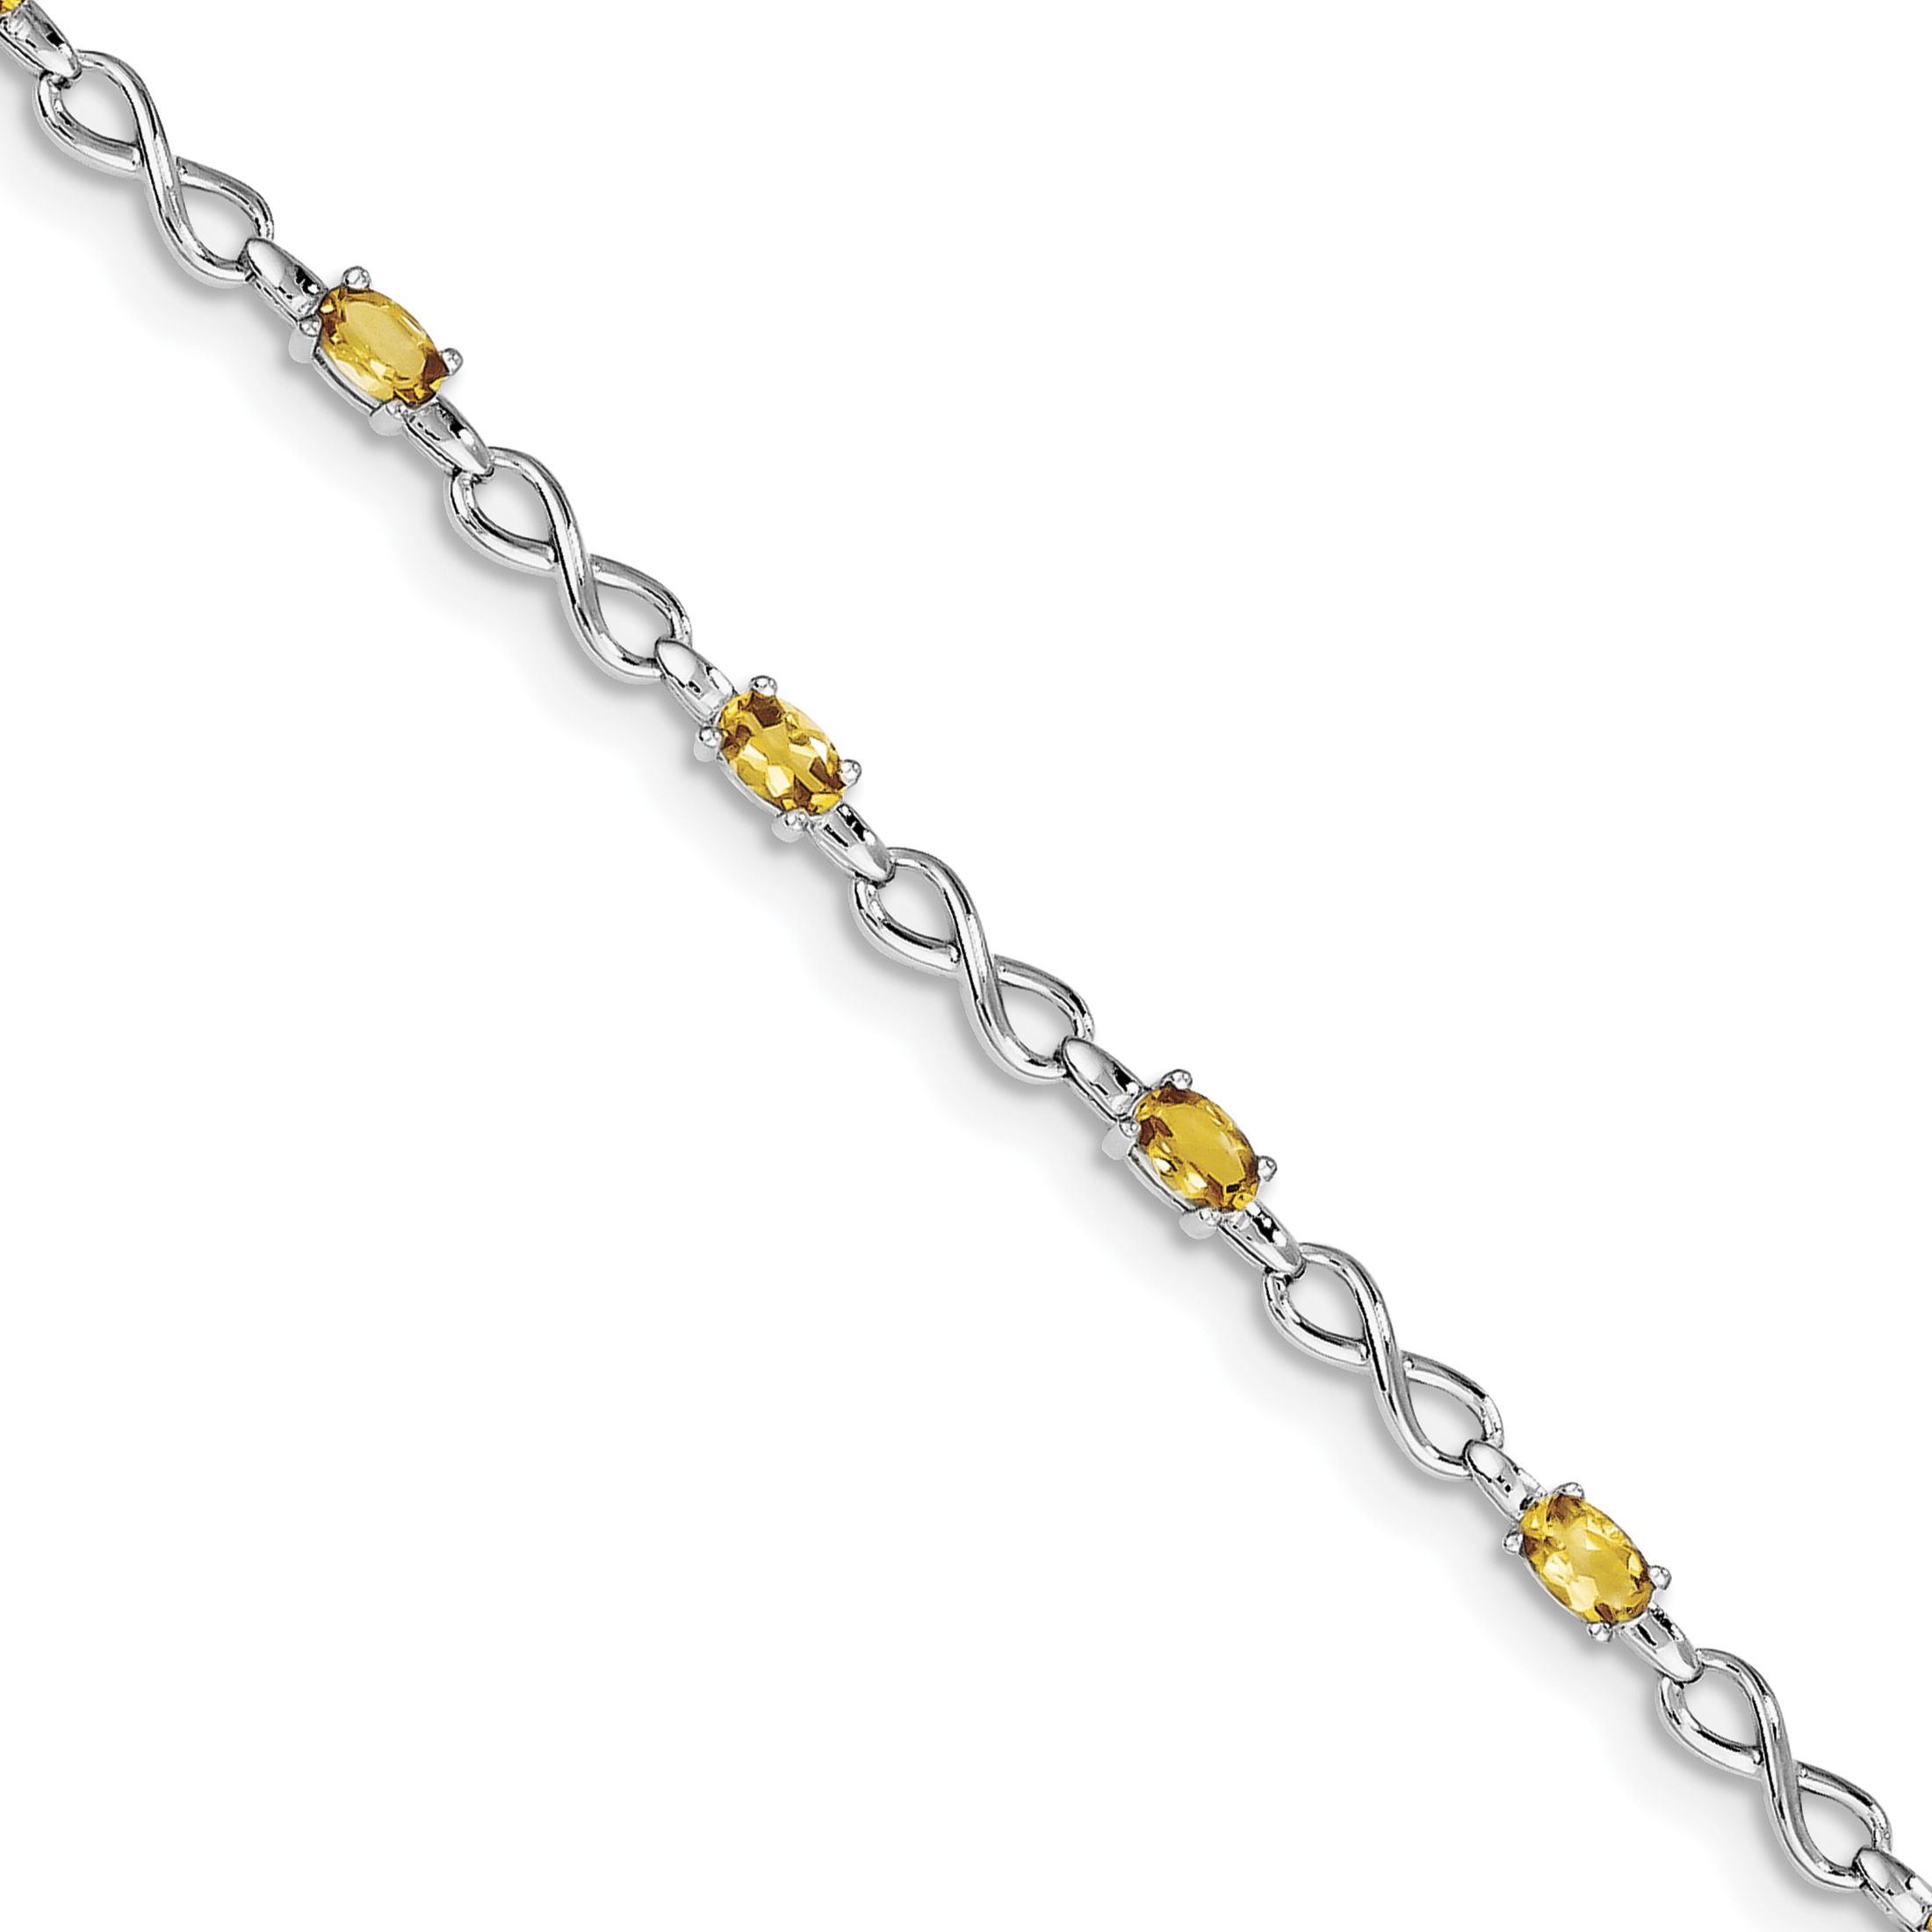 925 Sterling Silver Rhodium-plated Citrine Bracelet by